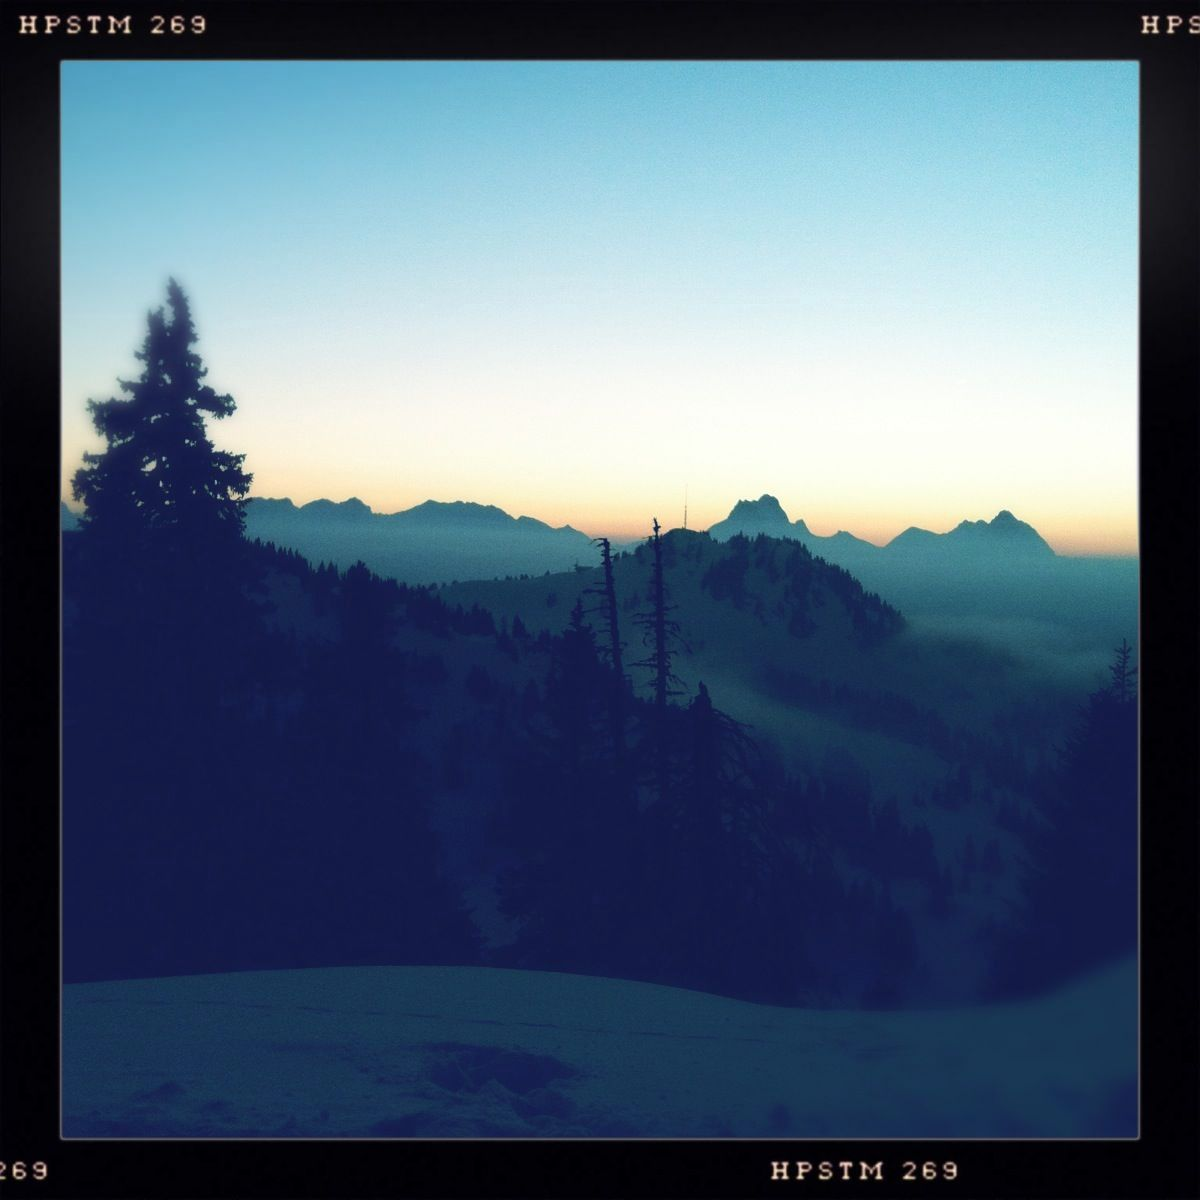 Wintersport in Gastaad43